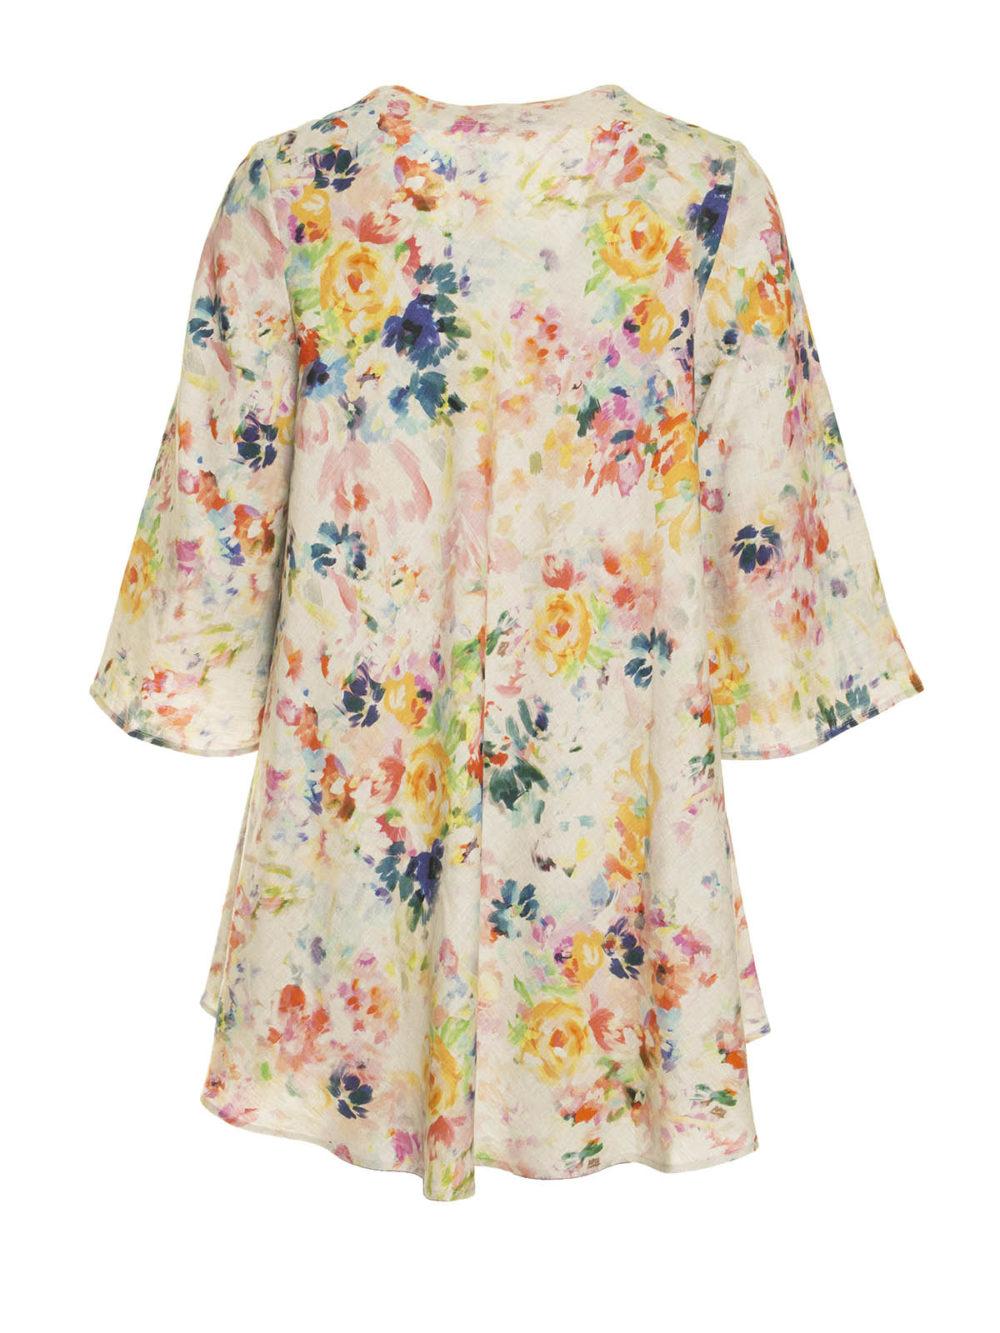 Avy Shirt Ralston Katie Kerr Women's Clothing